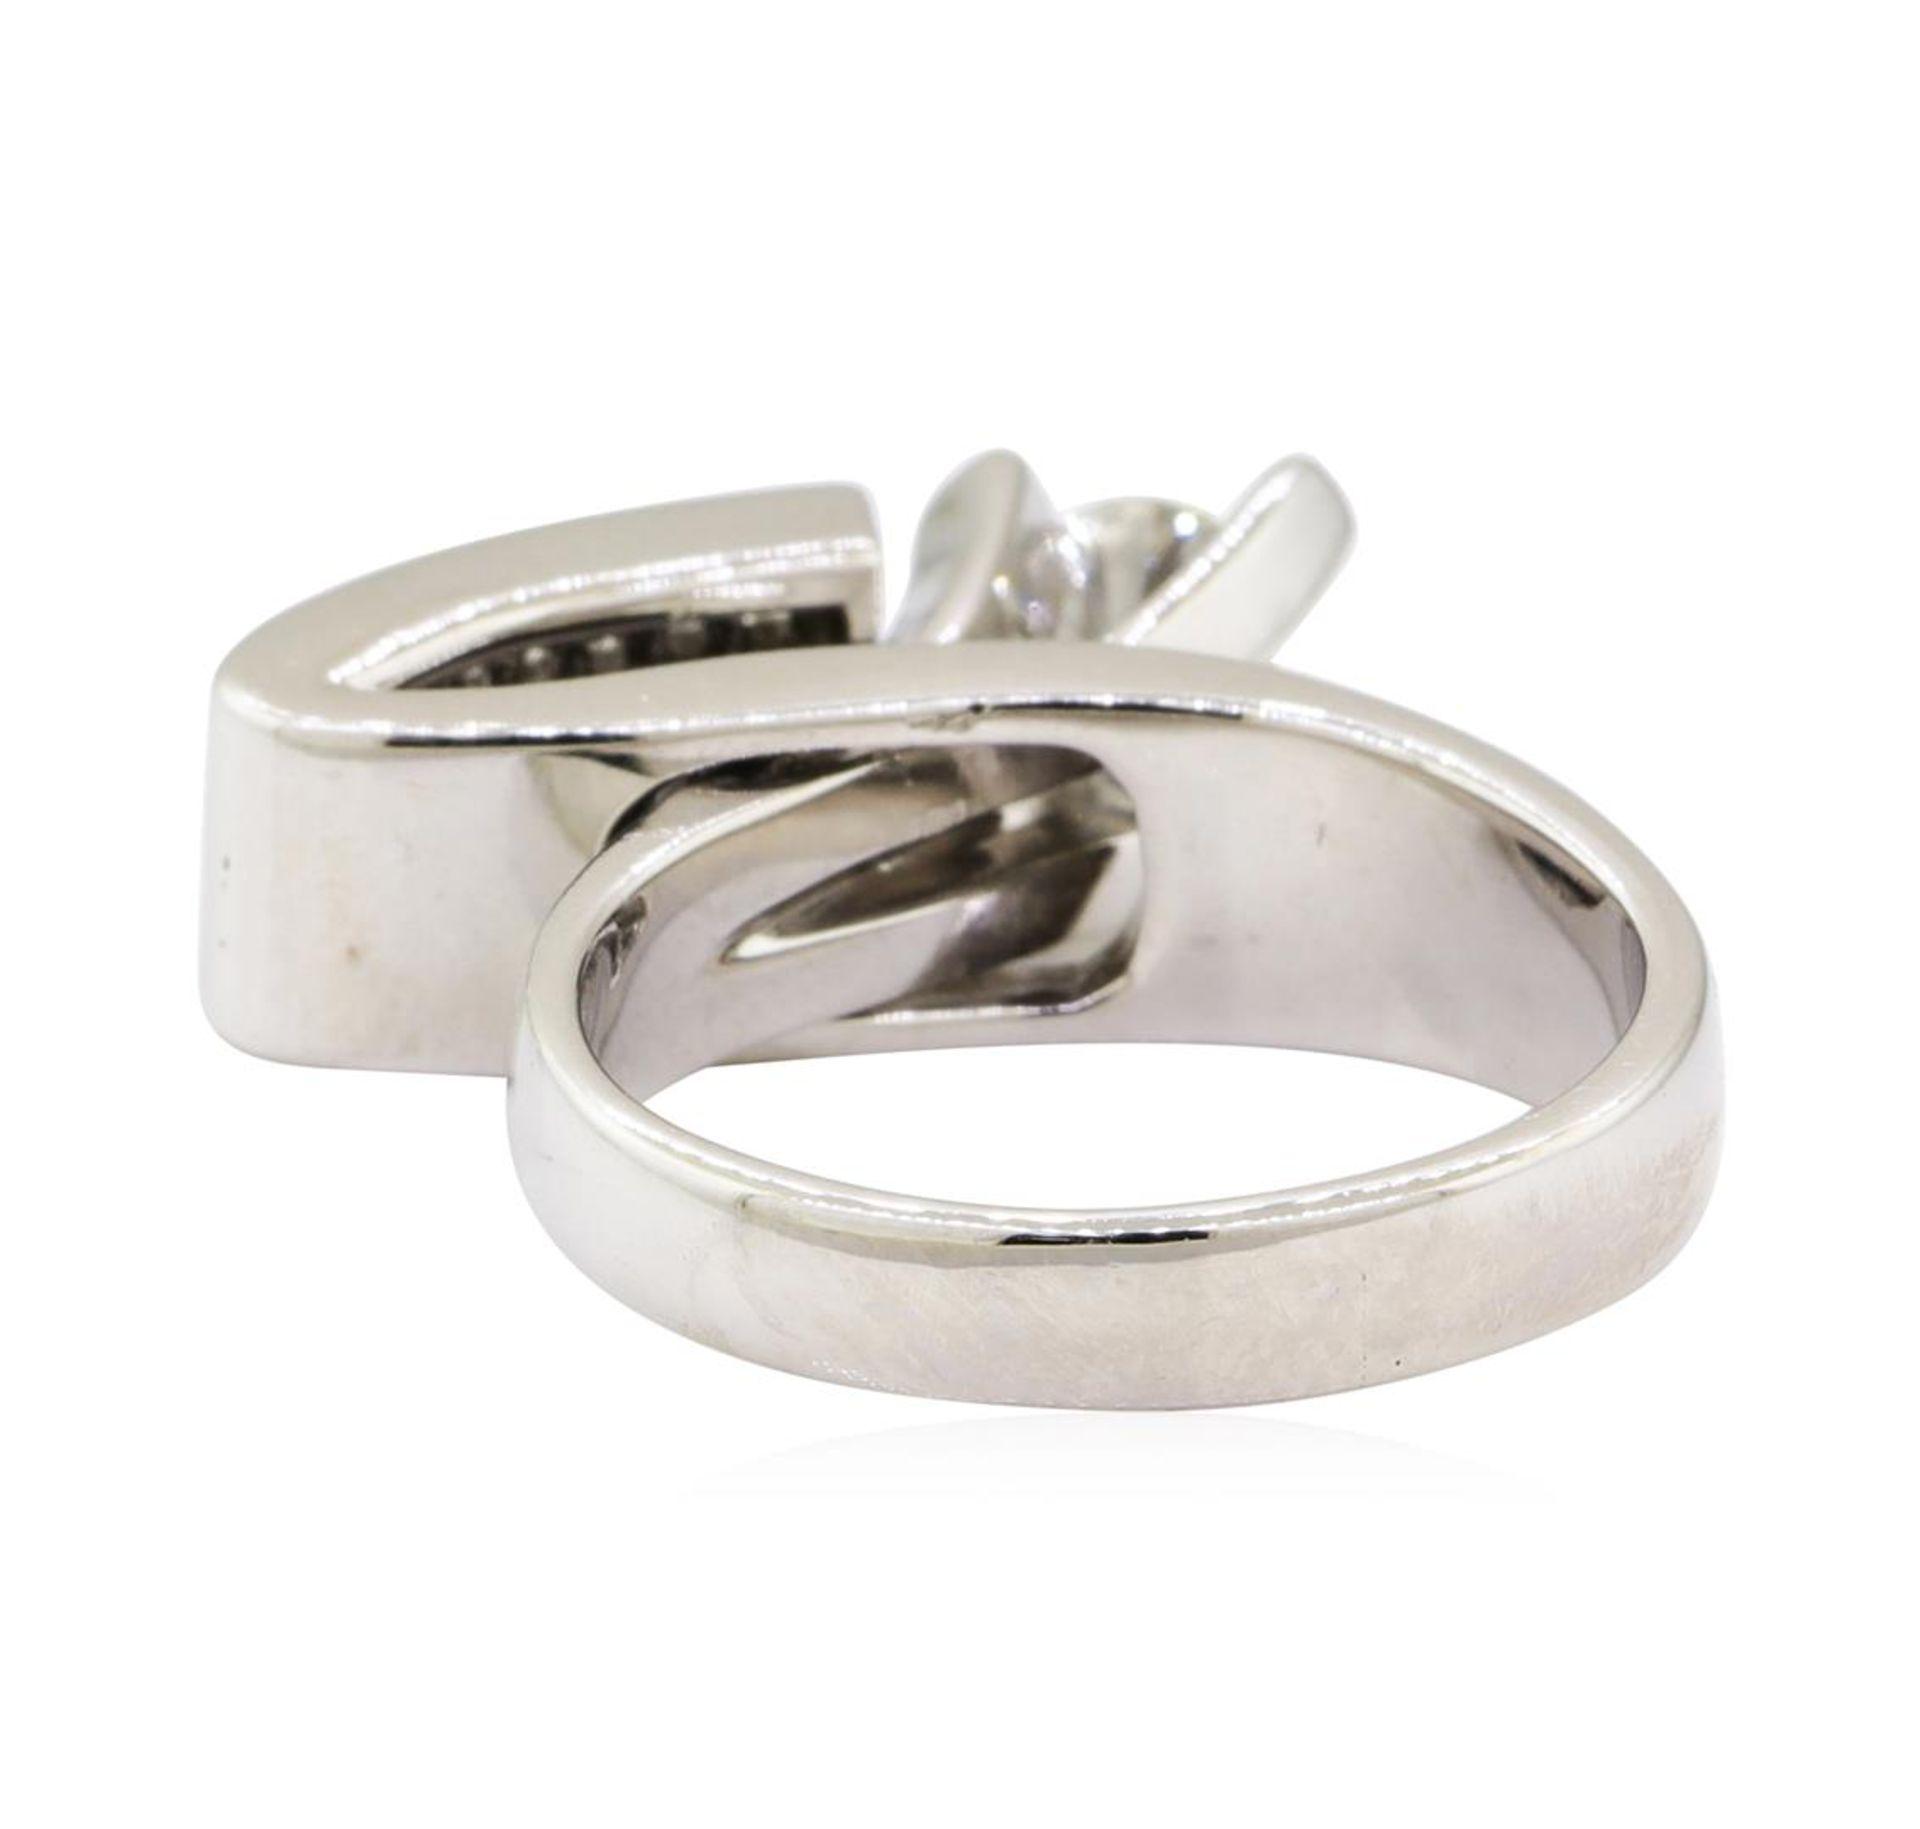 1.29 ctw Diamond Ring - 14KT White Gold - Image 3 of 5